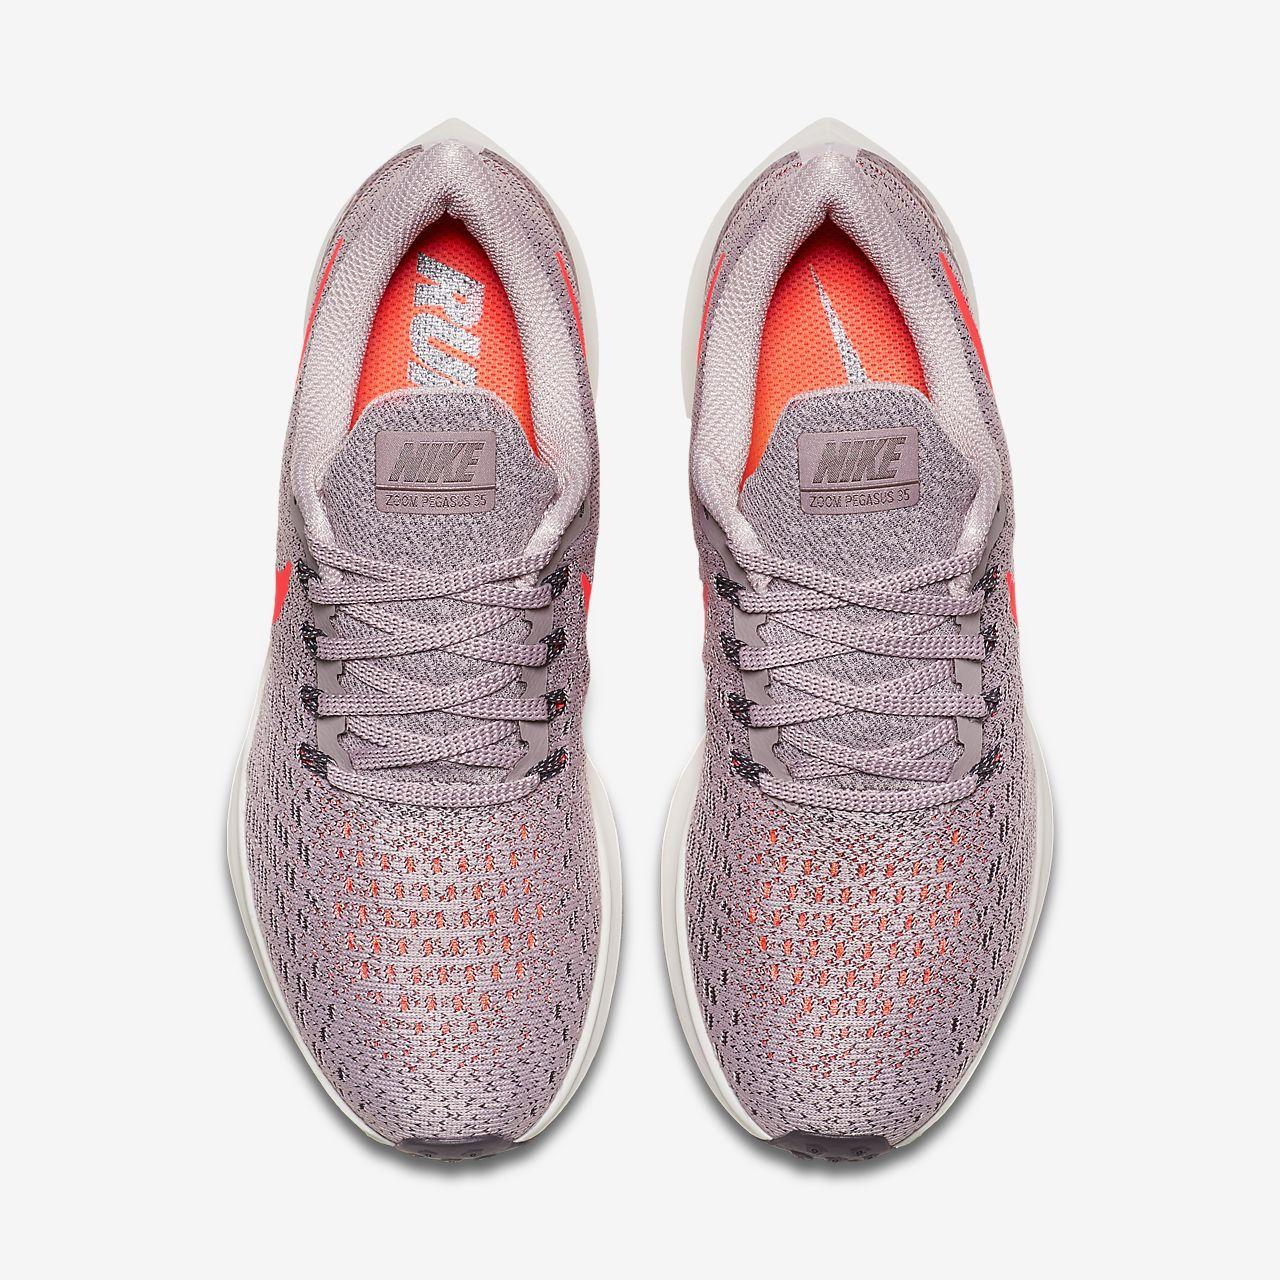 new product 71386 1d83a ... Chaussure de running Nike Air Zoom Pegasus 35 pour Femme